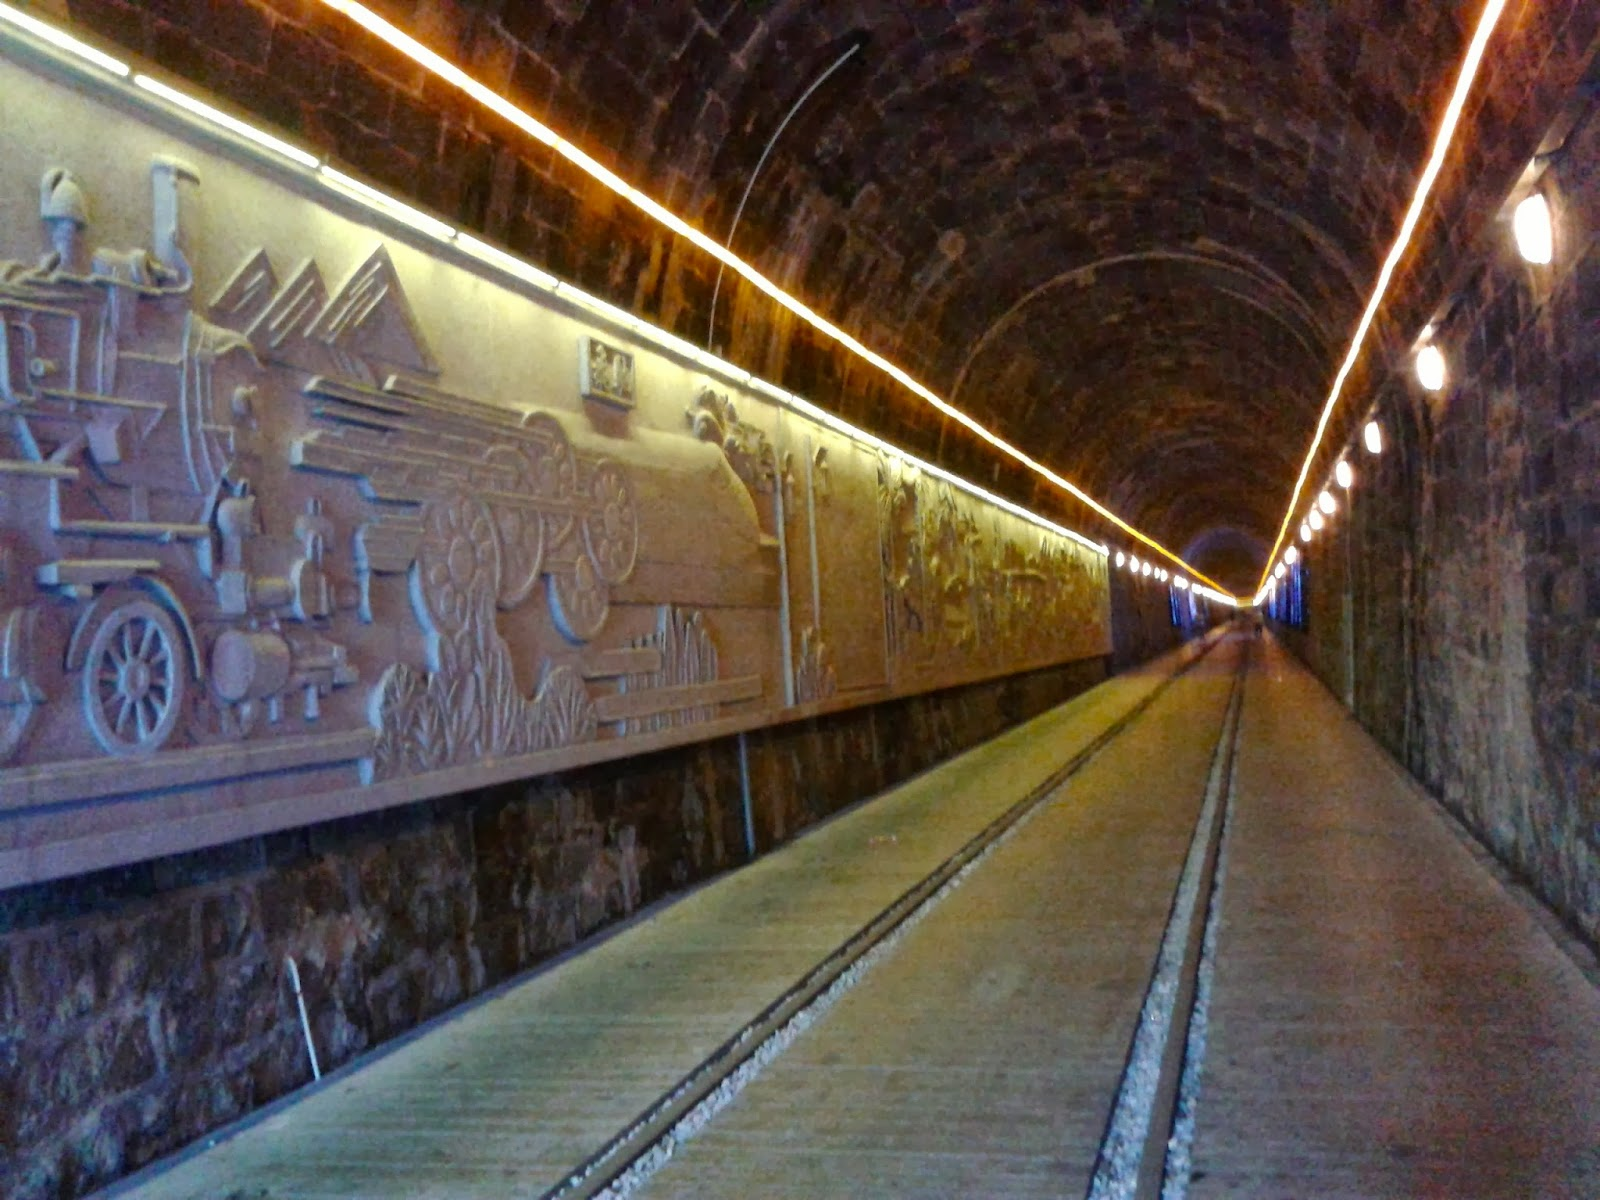 artwork inside the tunnel